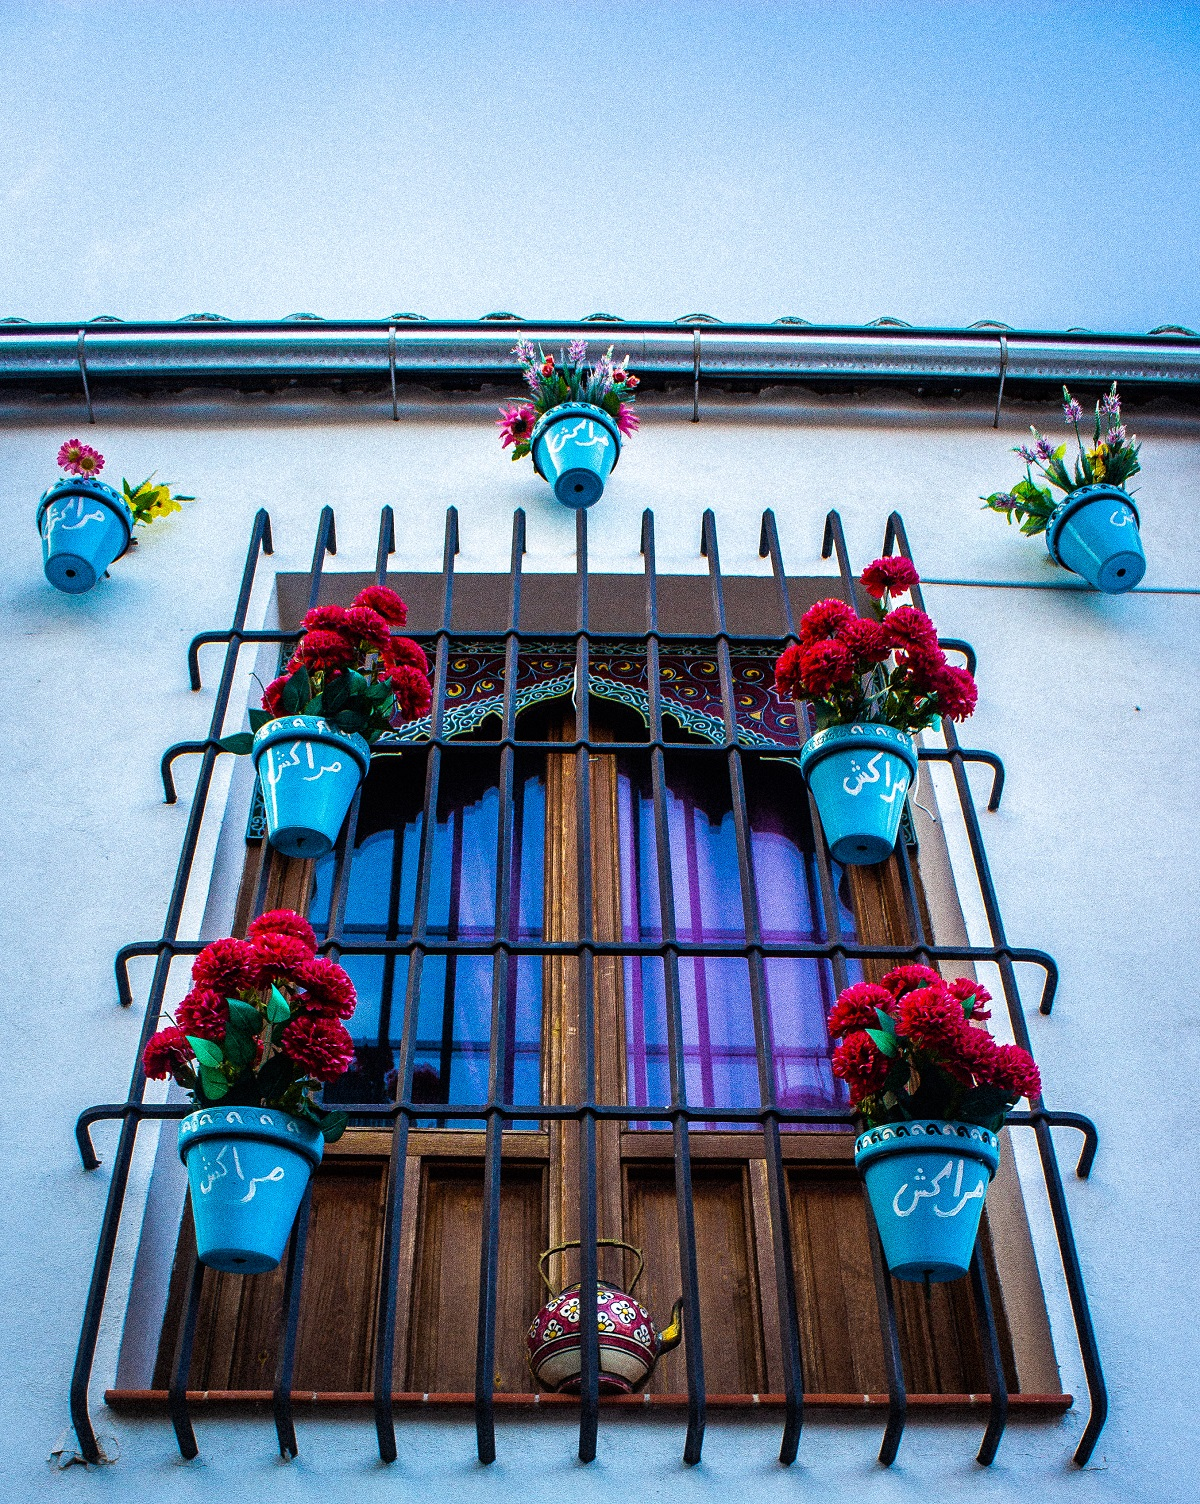 Granada Spain Travel Guide flowers